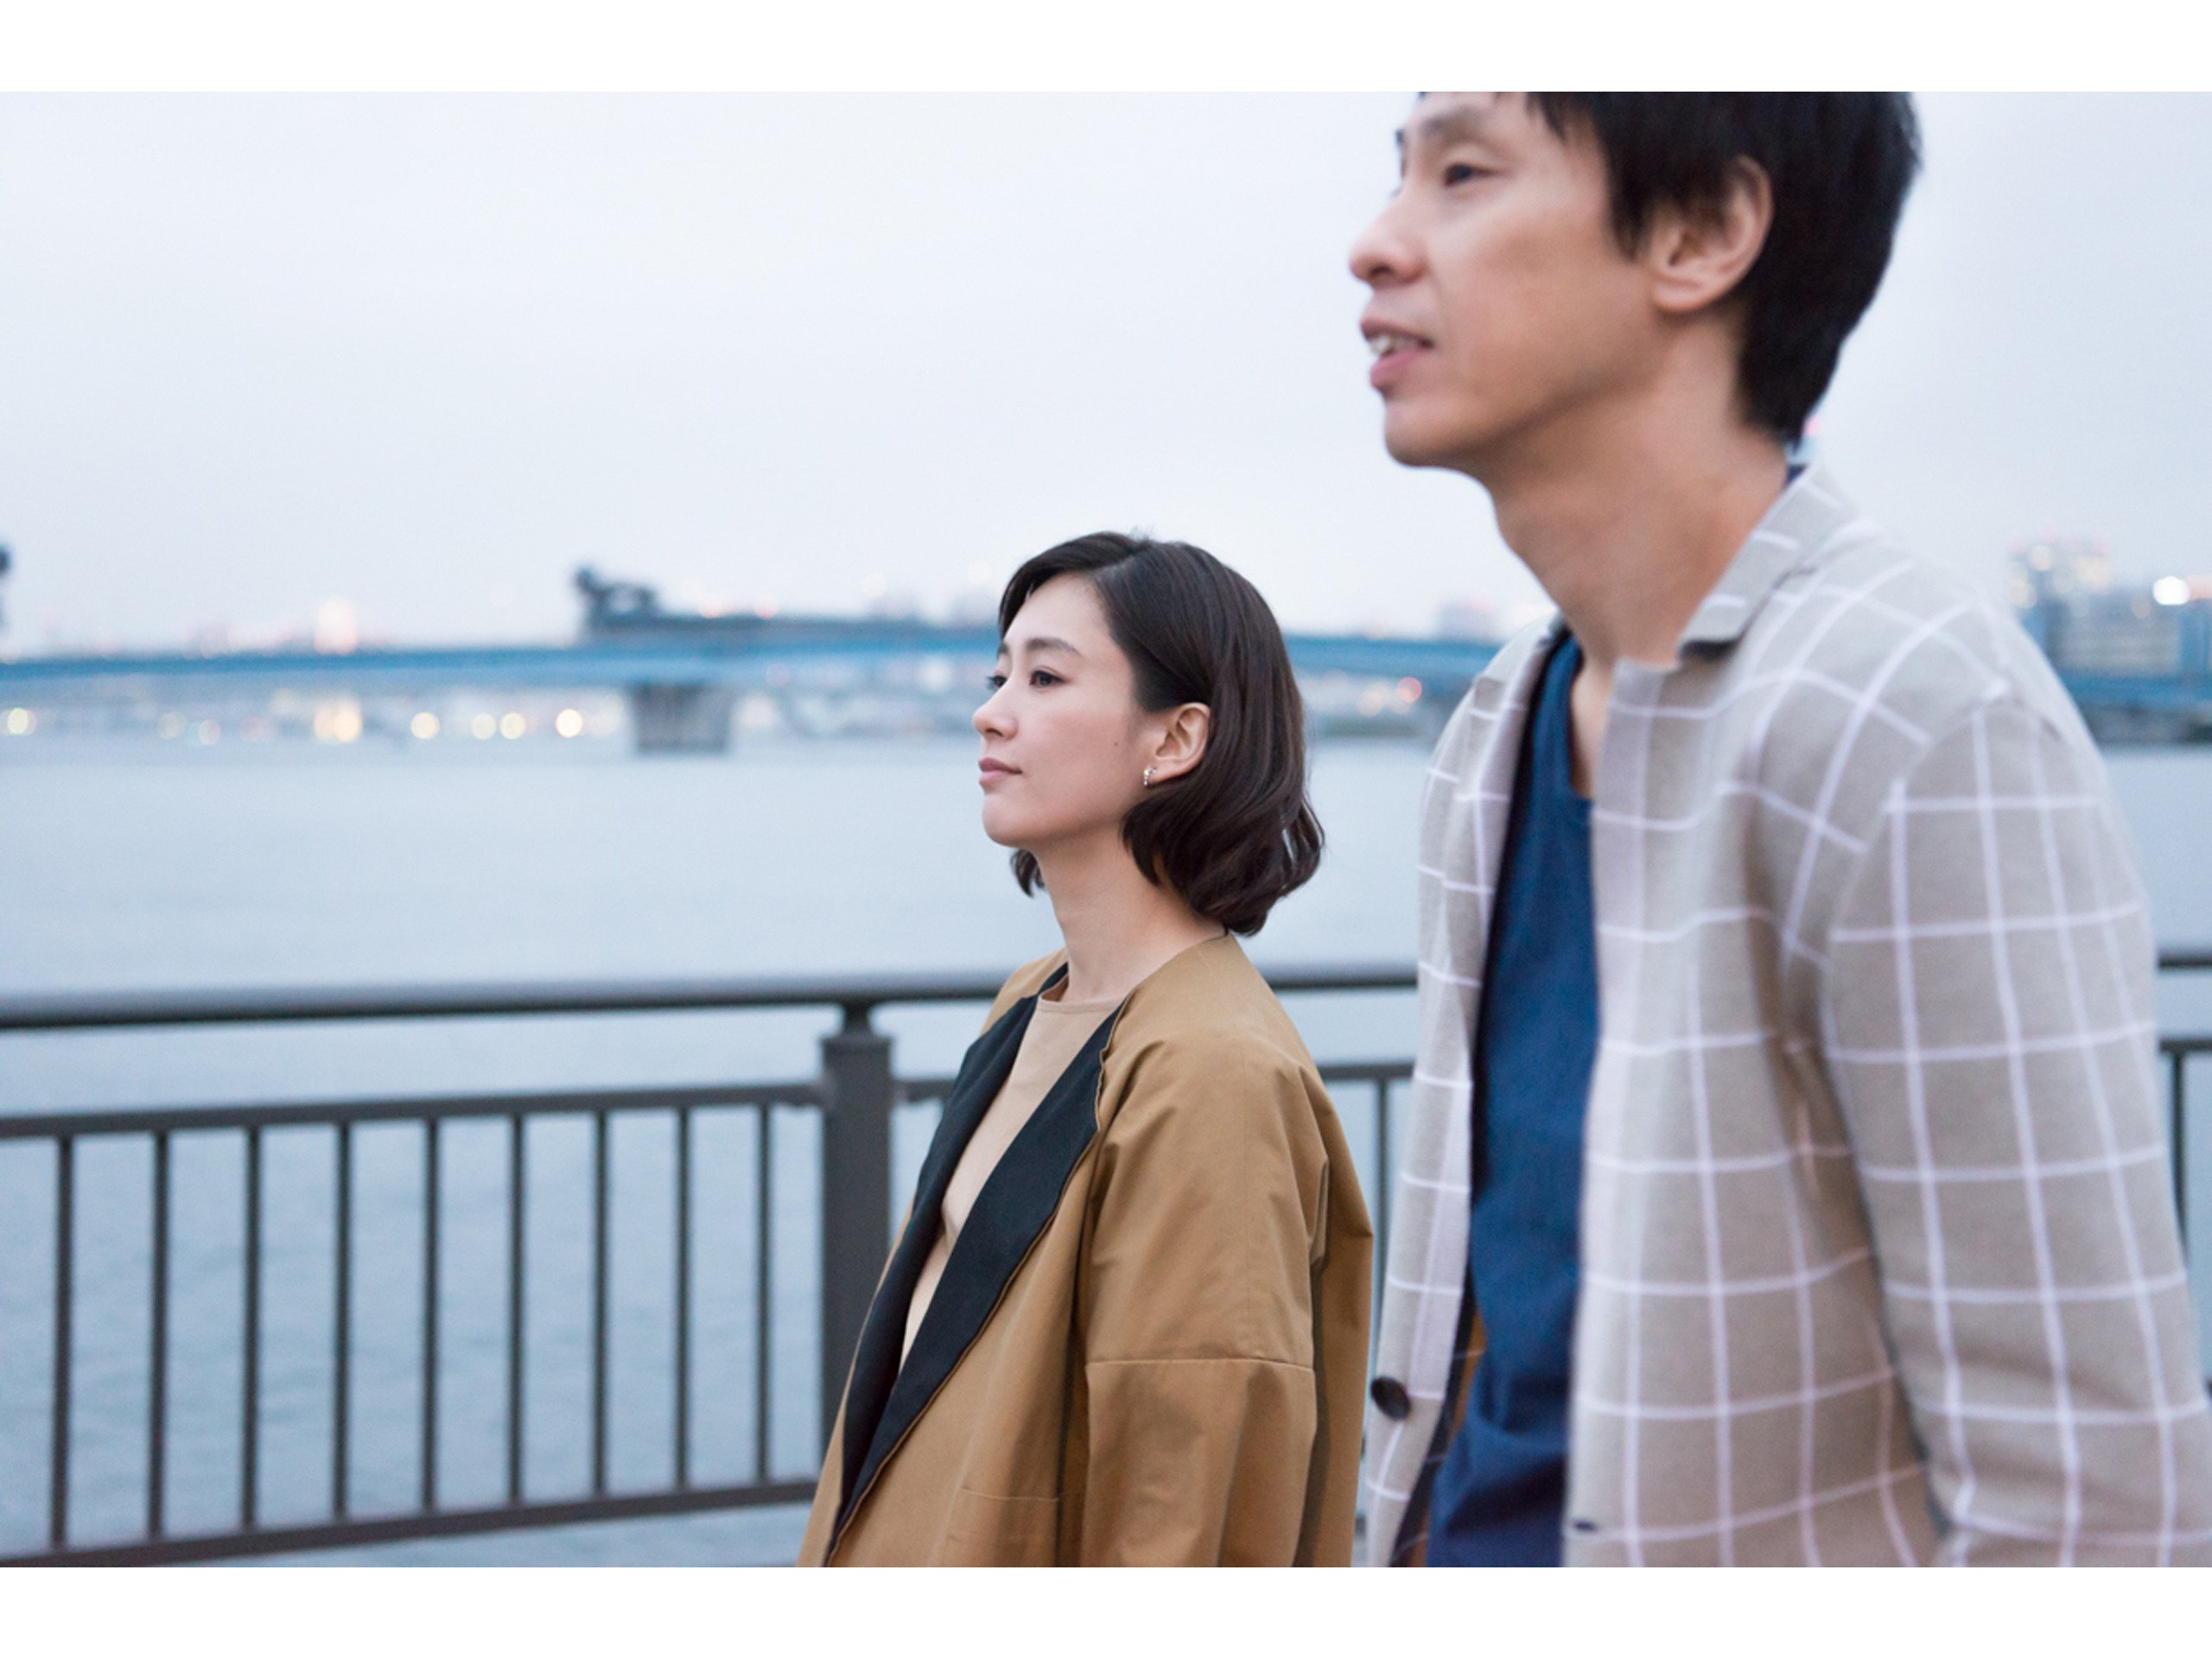 Amazon.co.jp: 東京女子図鑑: 水川あさみ, タナダユキ, 黒沢久子, 中間 ...